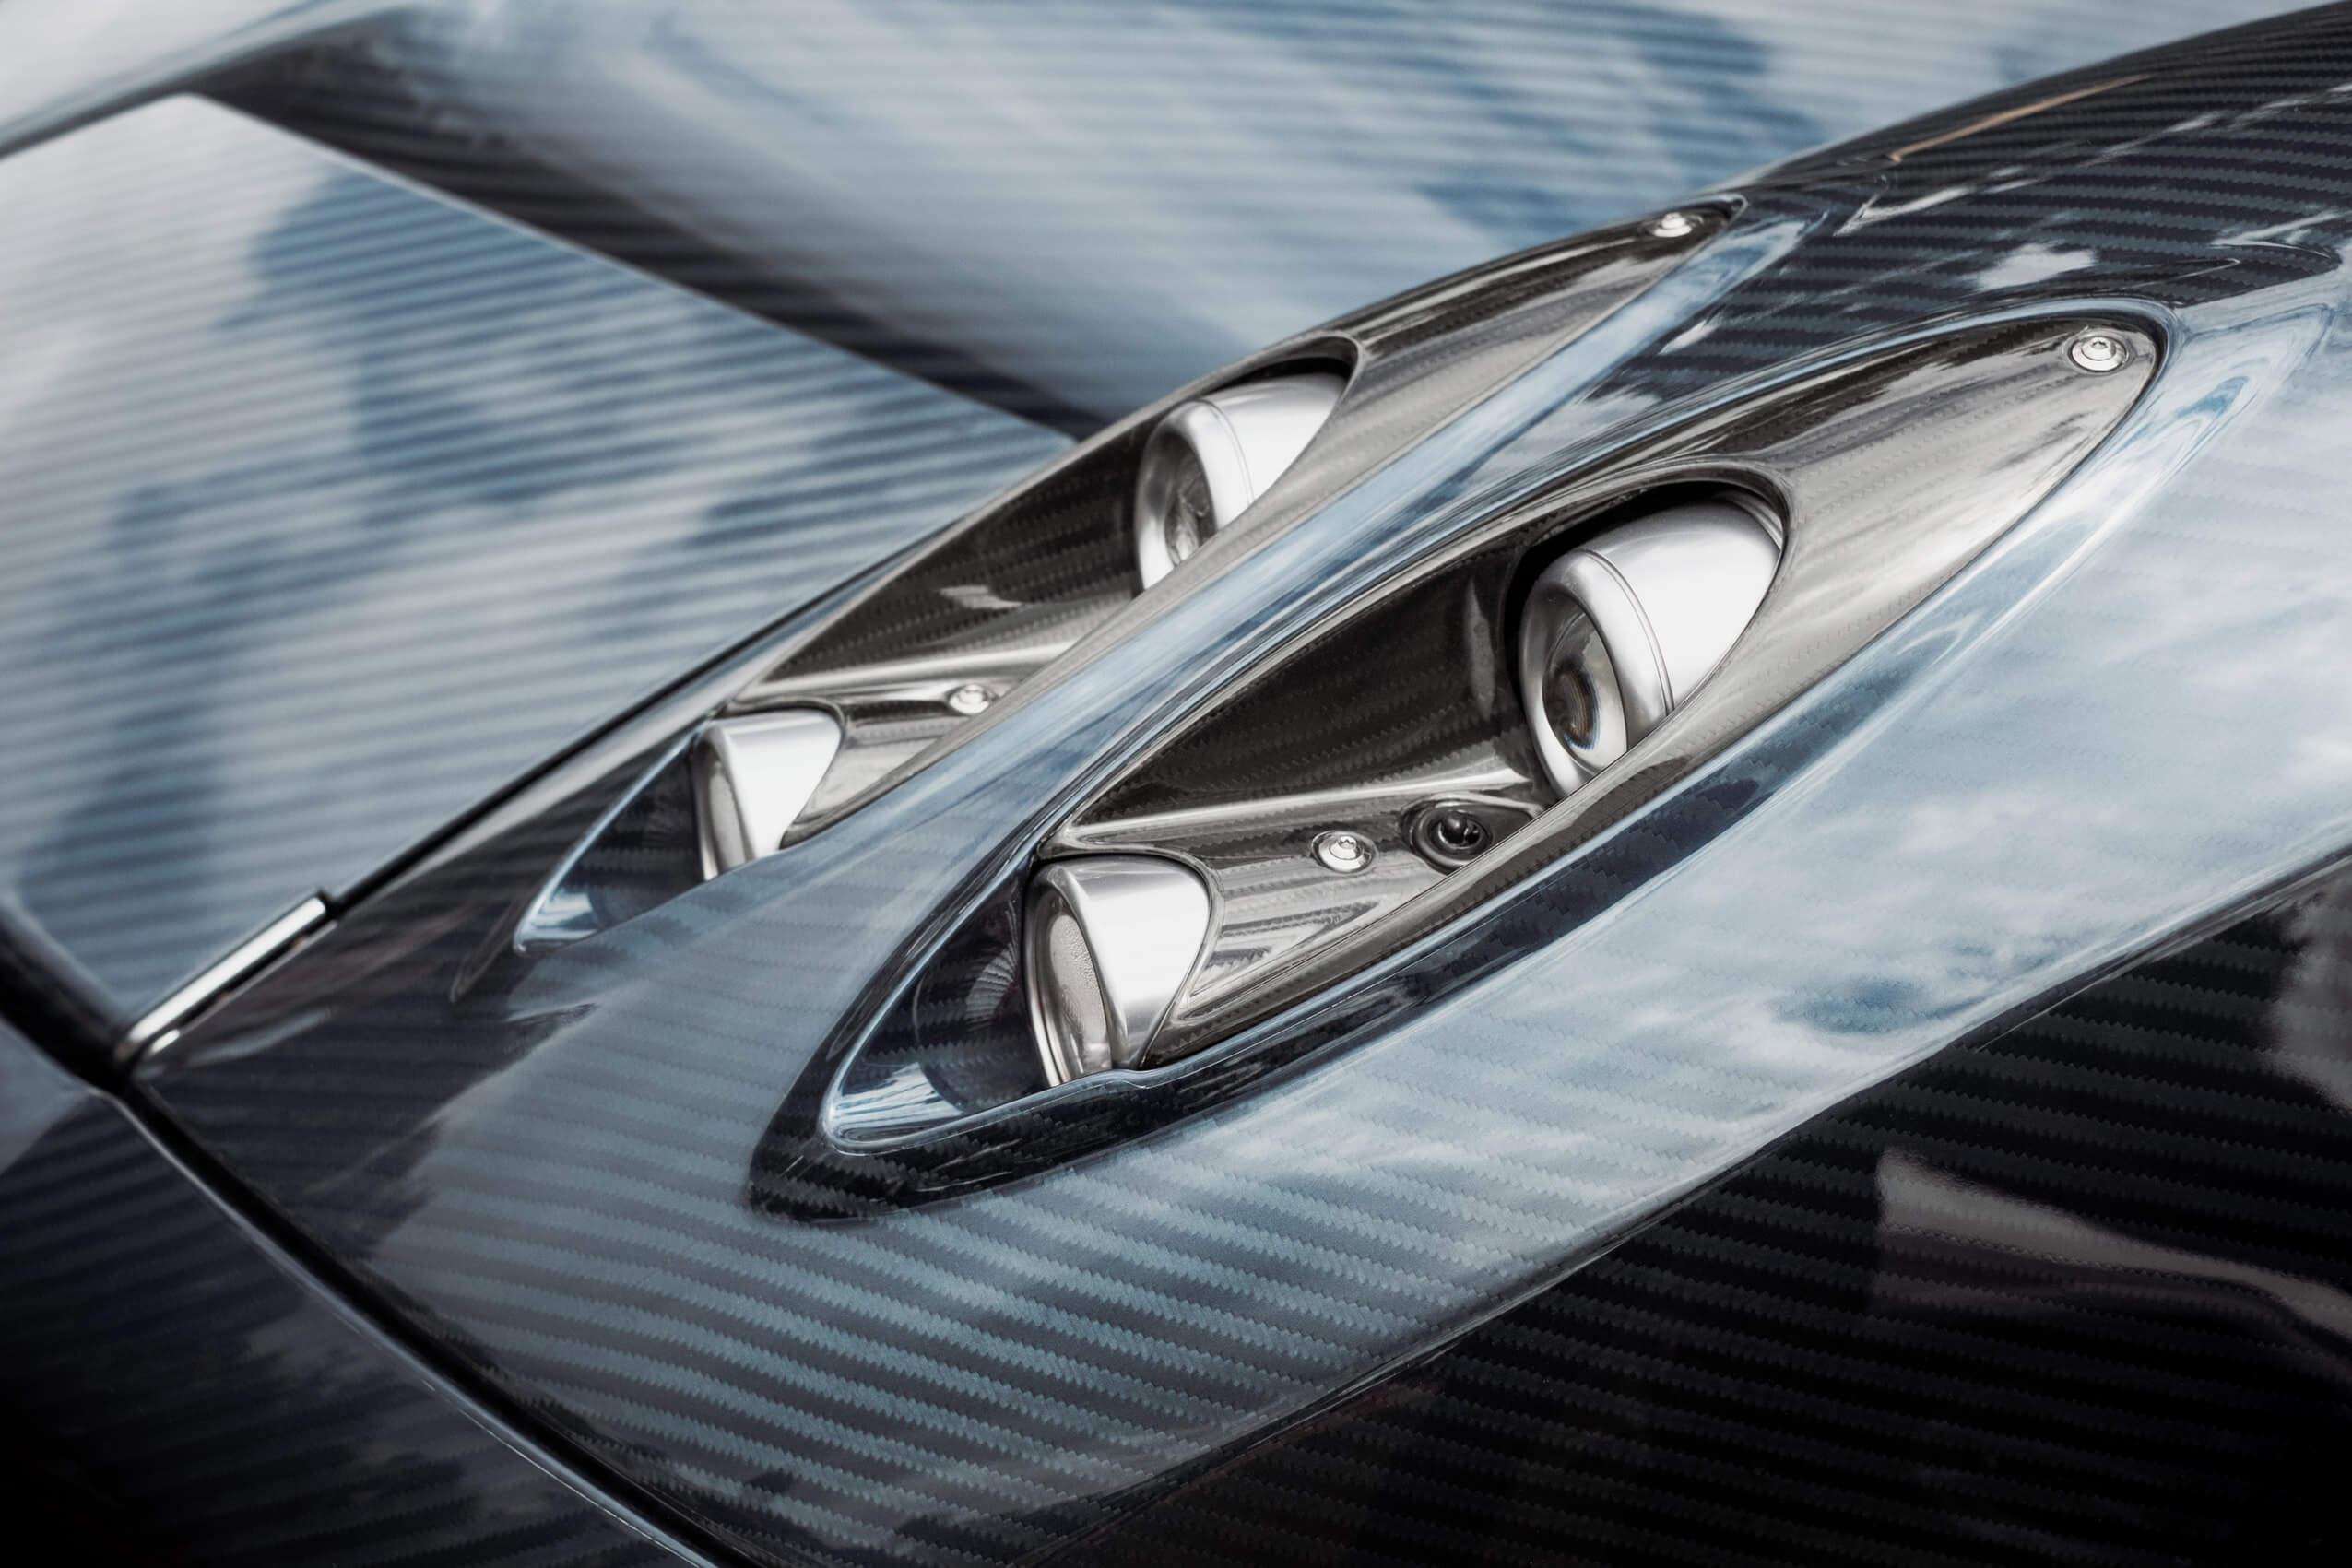 Carbon fiber composite sports car